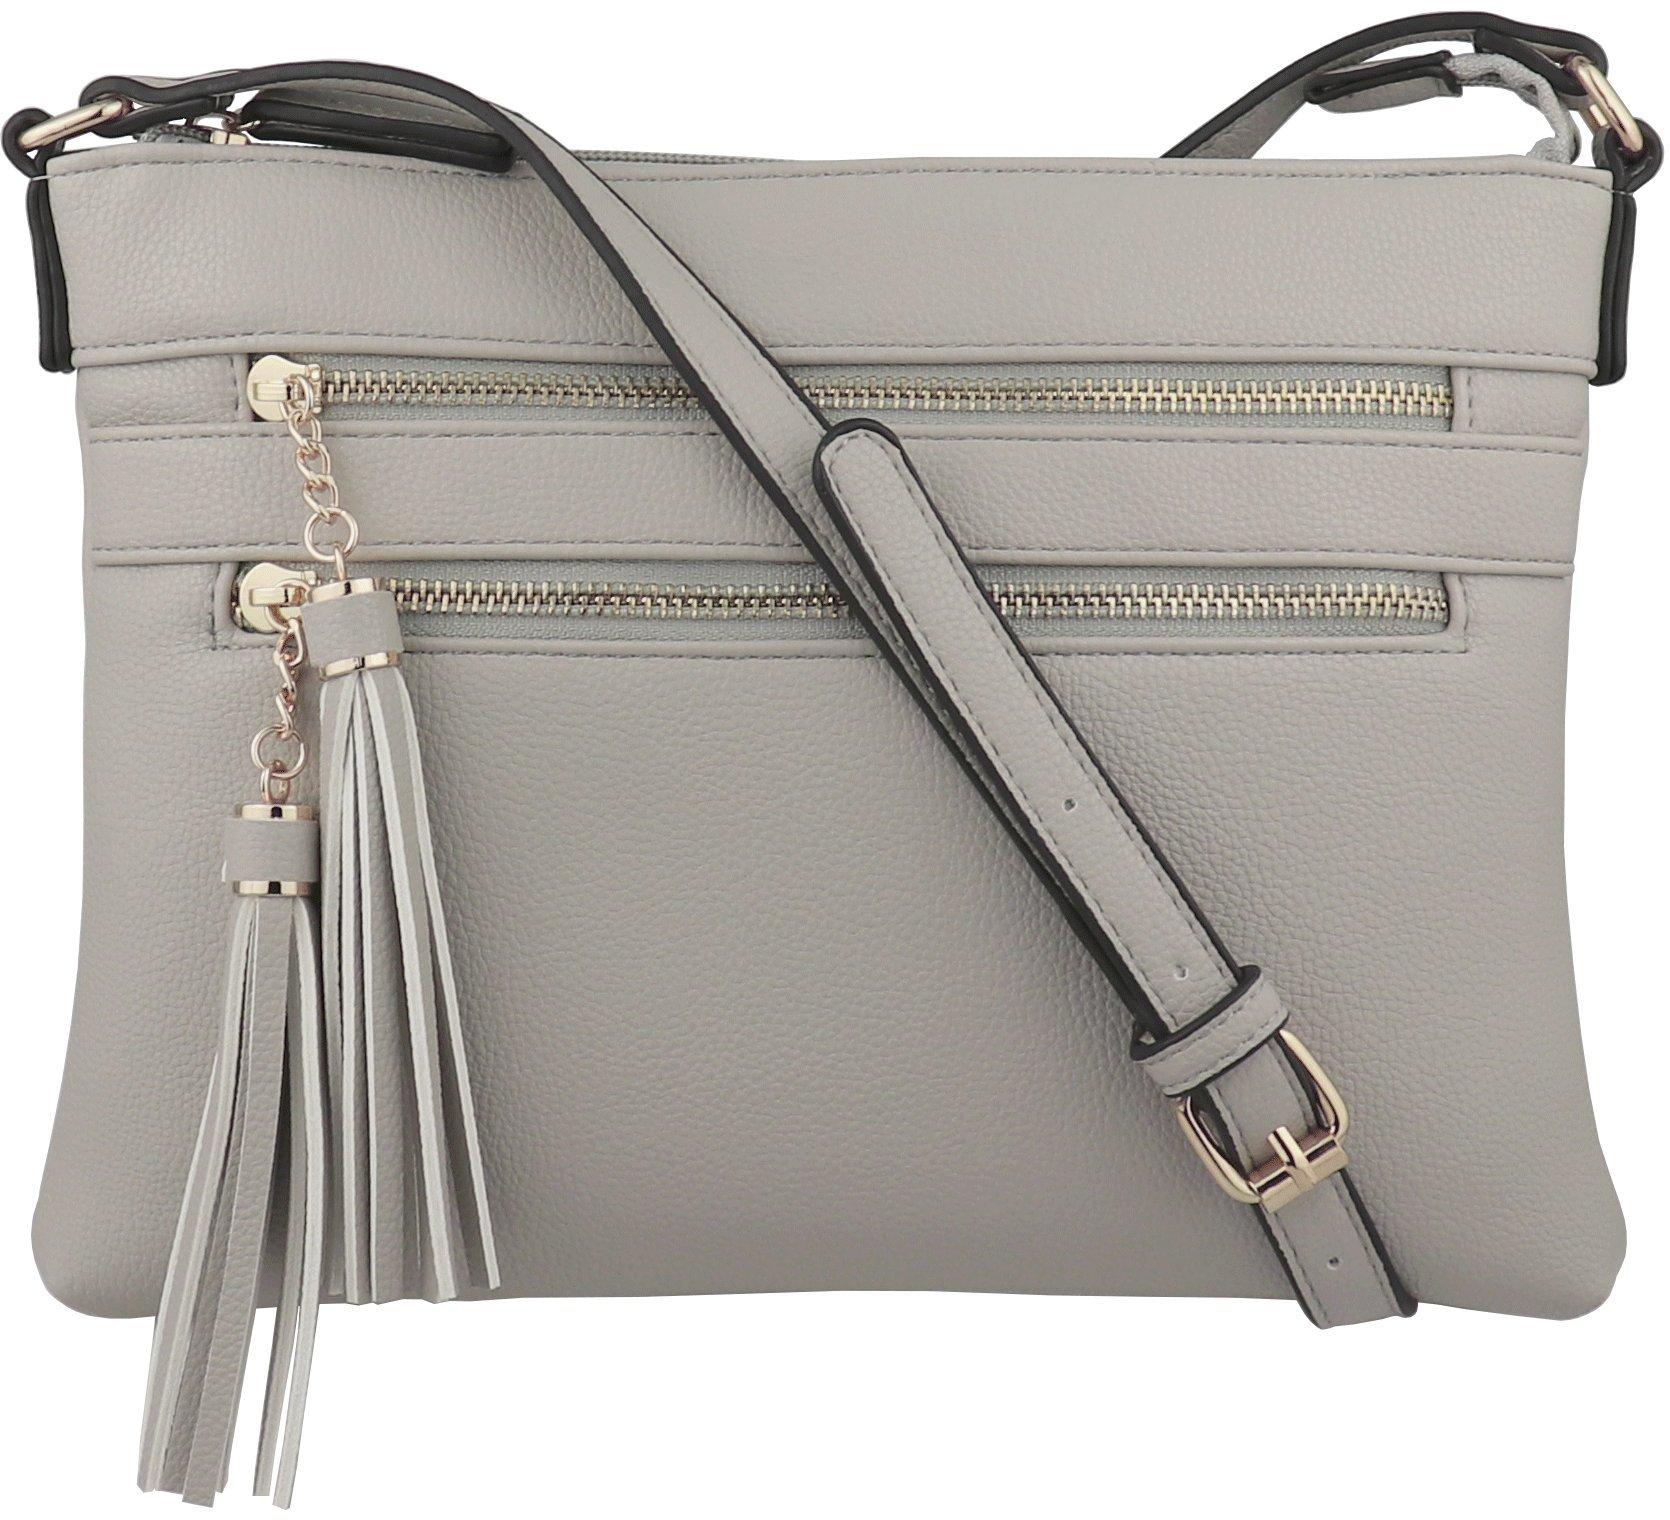 B BRENTANO Vegan Multi-Zipper Crossbody Handbag Purse with Tassel Accents (Gray(N))